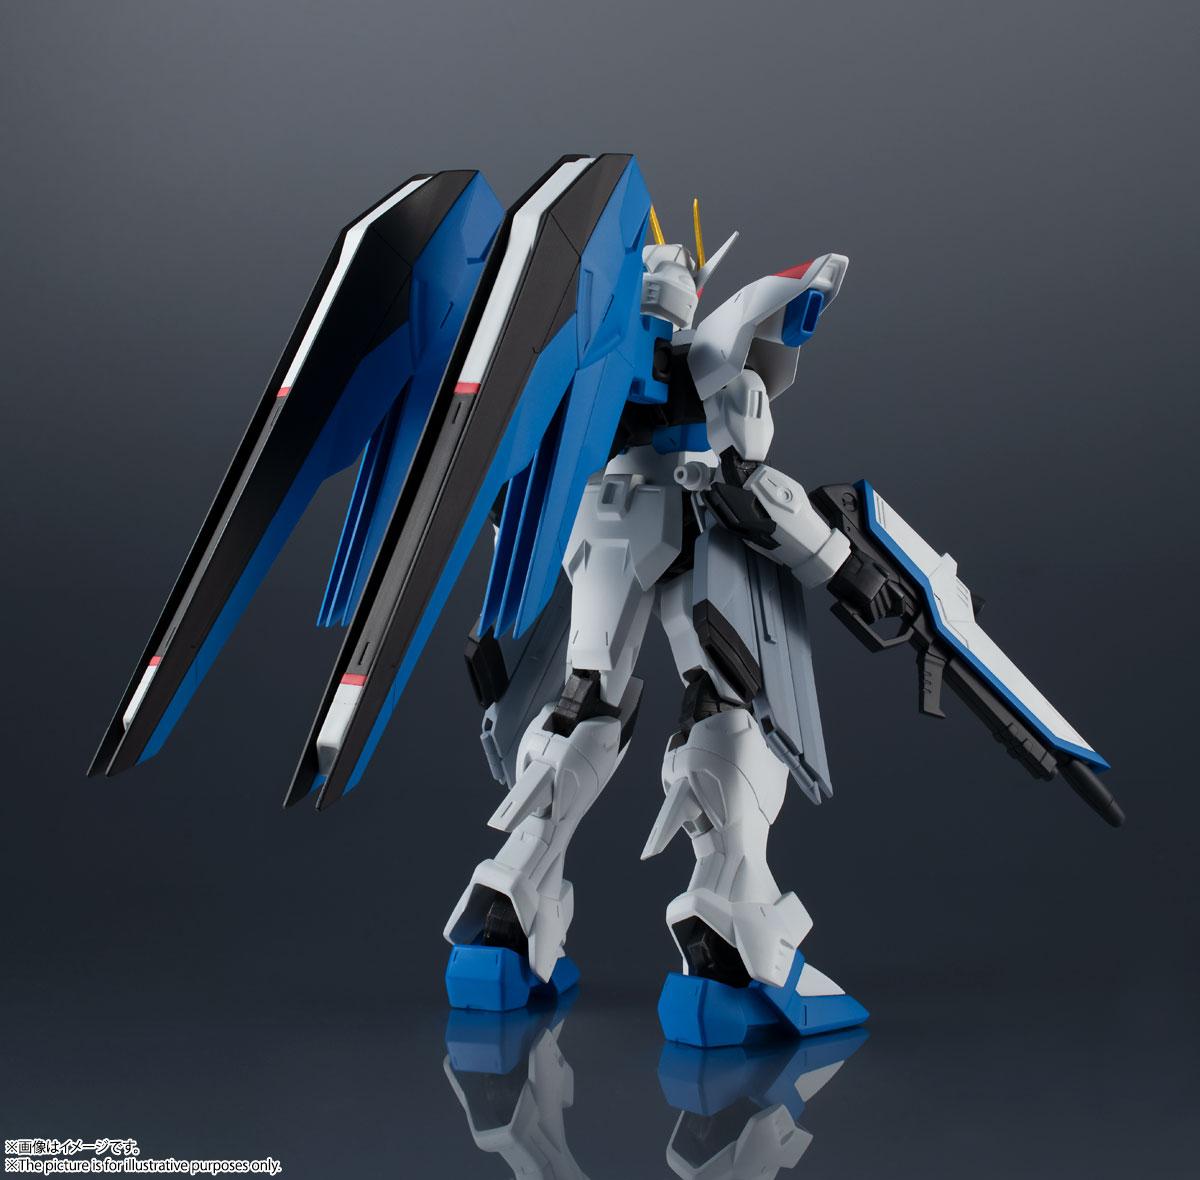 GUNDAM UNIVERSE『GN-001 GUNDAM EXIA/ガンダムエクシア』機動戦士ガンダム00 可動フィギュア-009